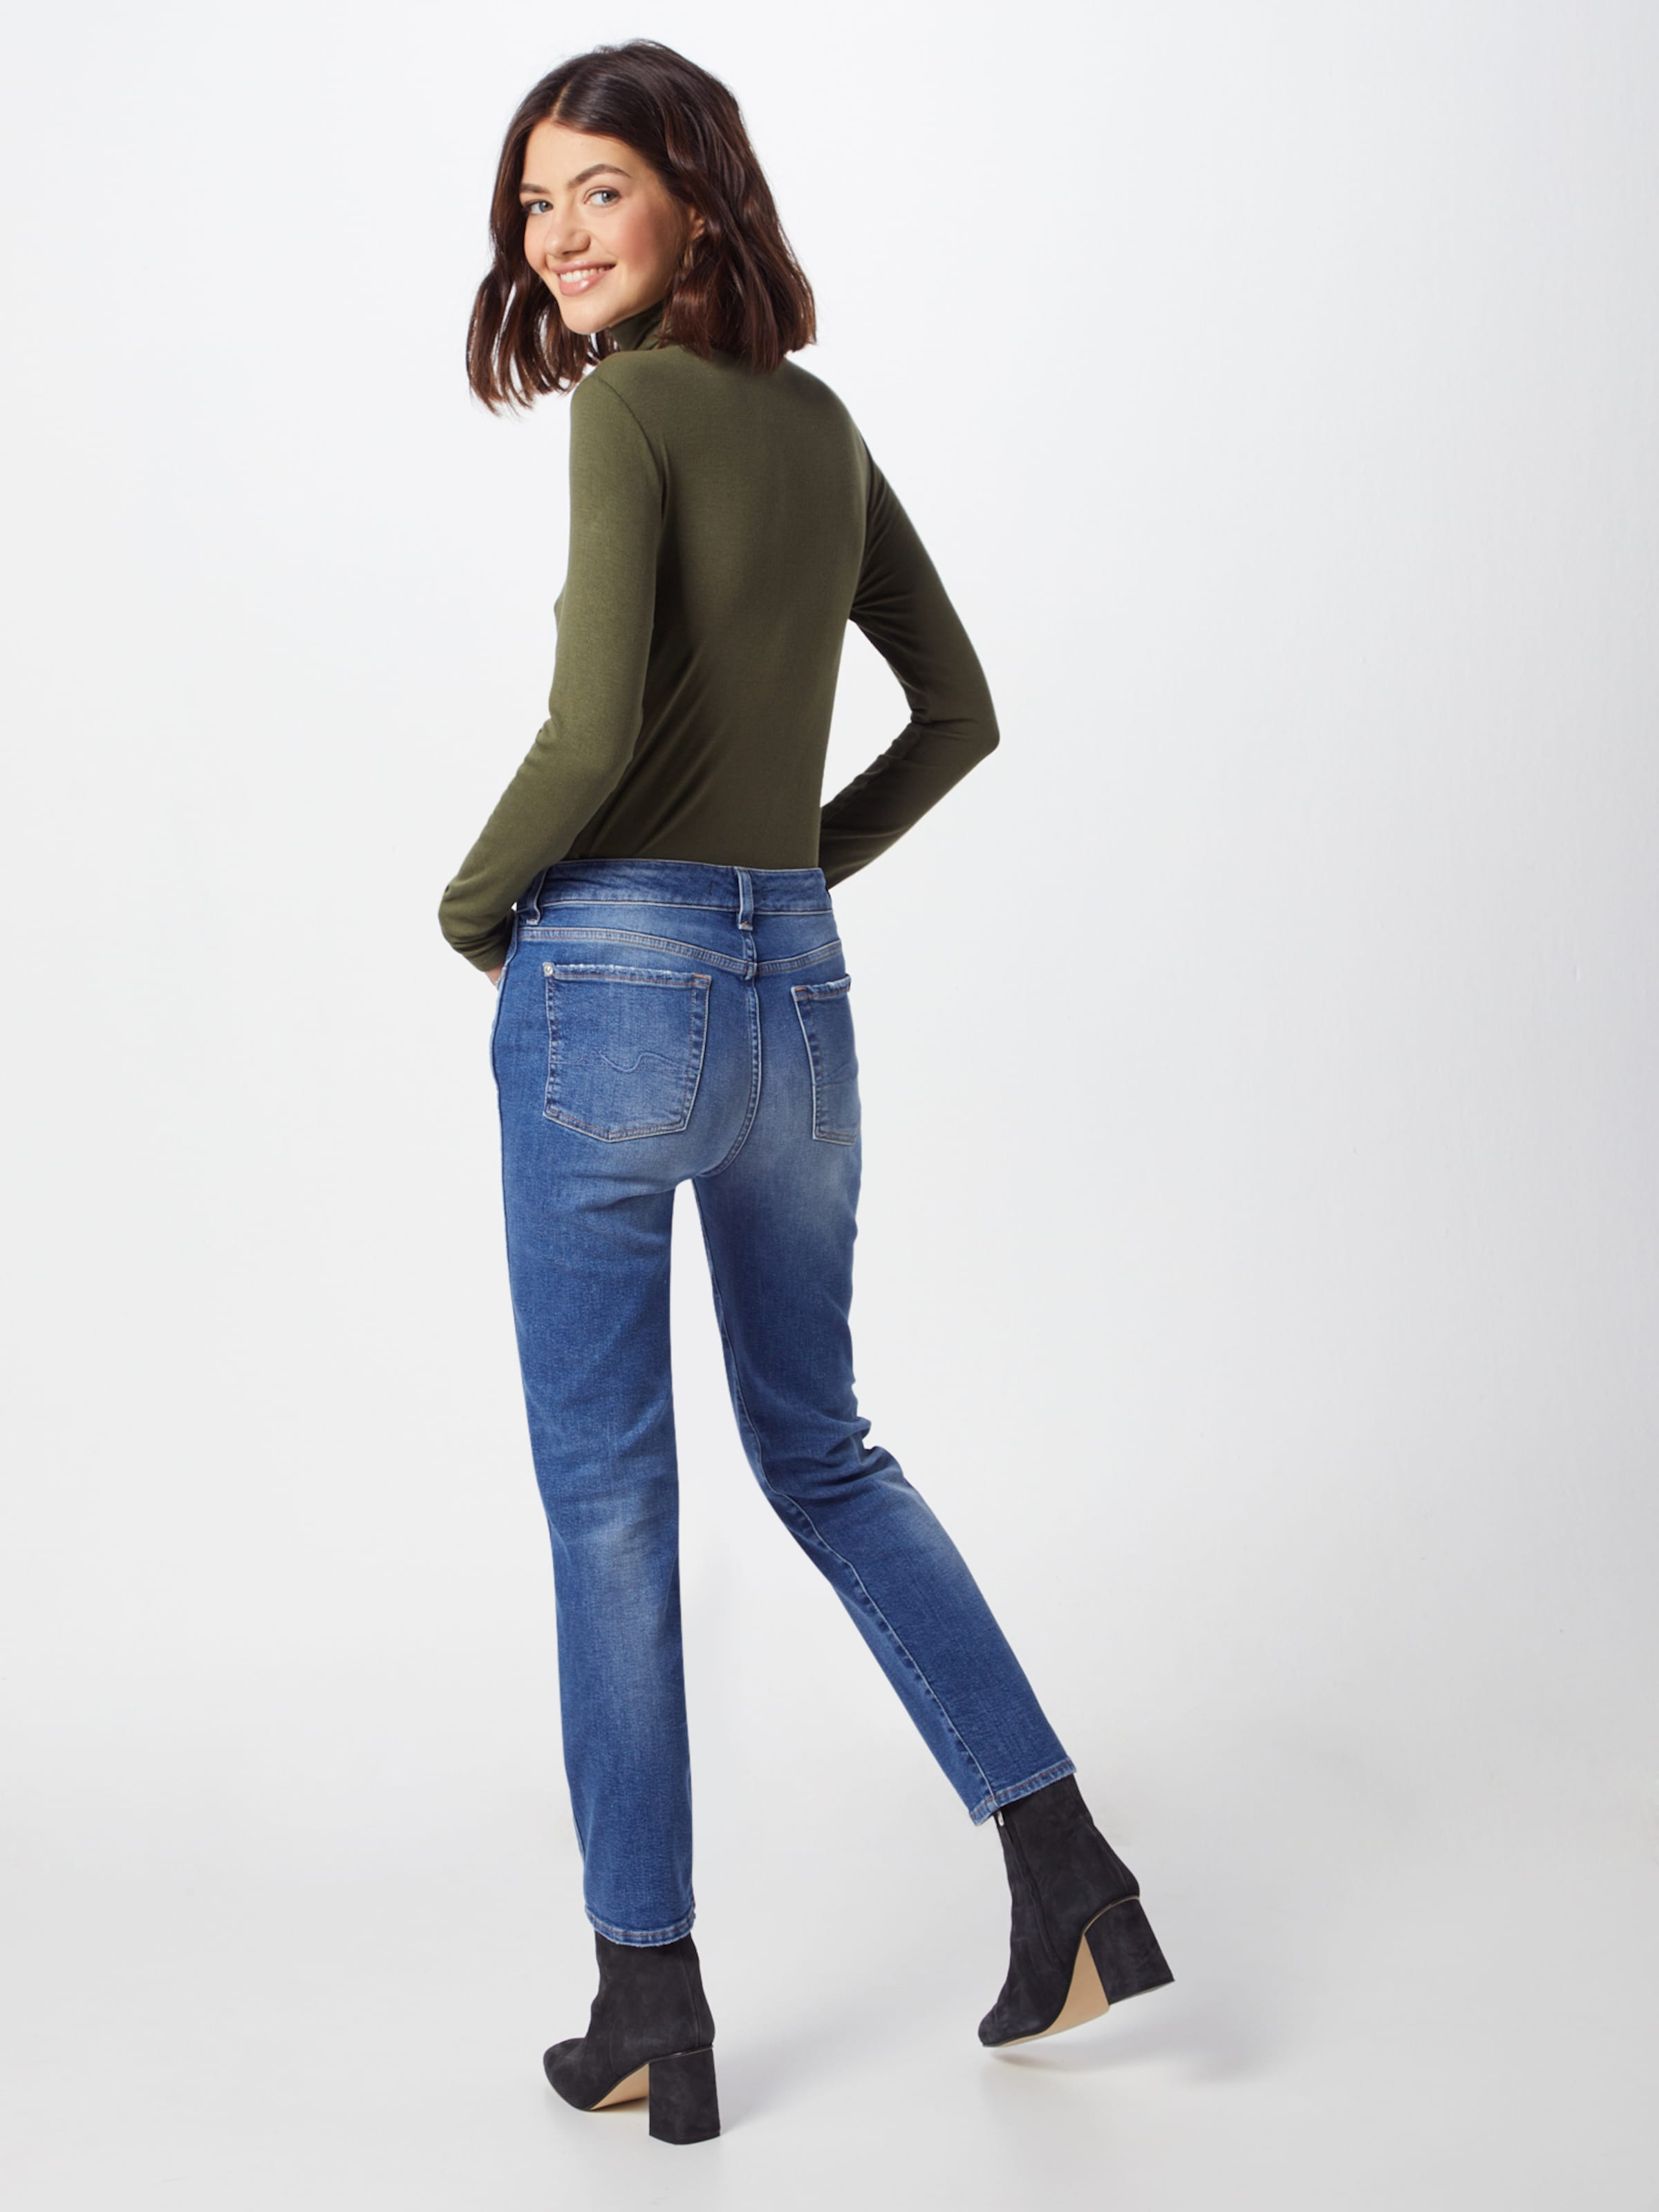 For Blue Jeans 'erin' Mankind All Denim 7 In qSMVpUz